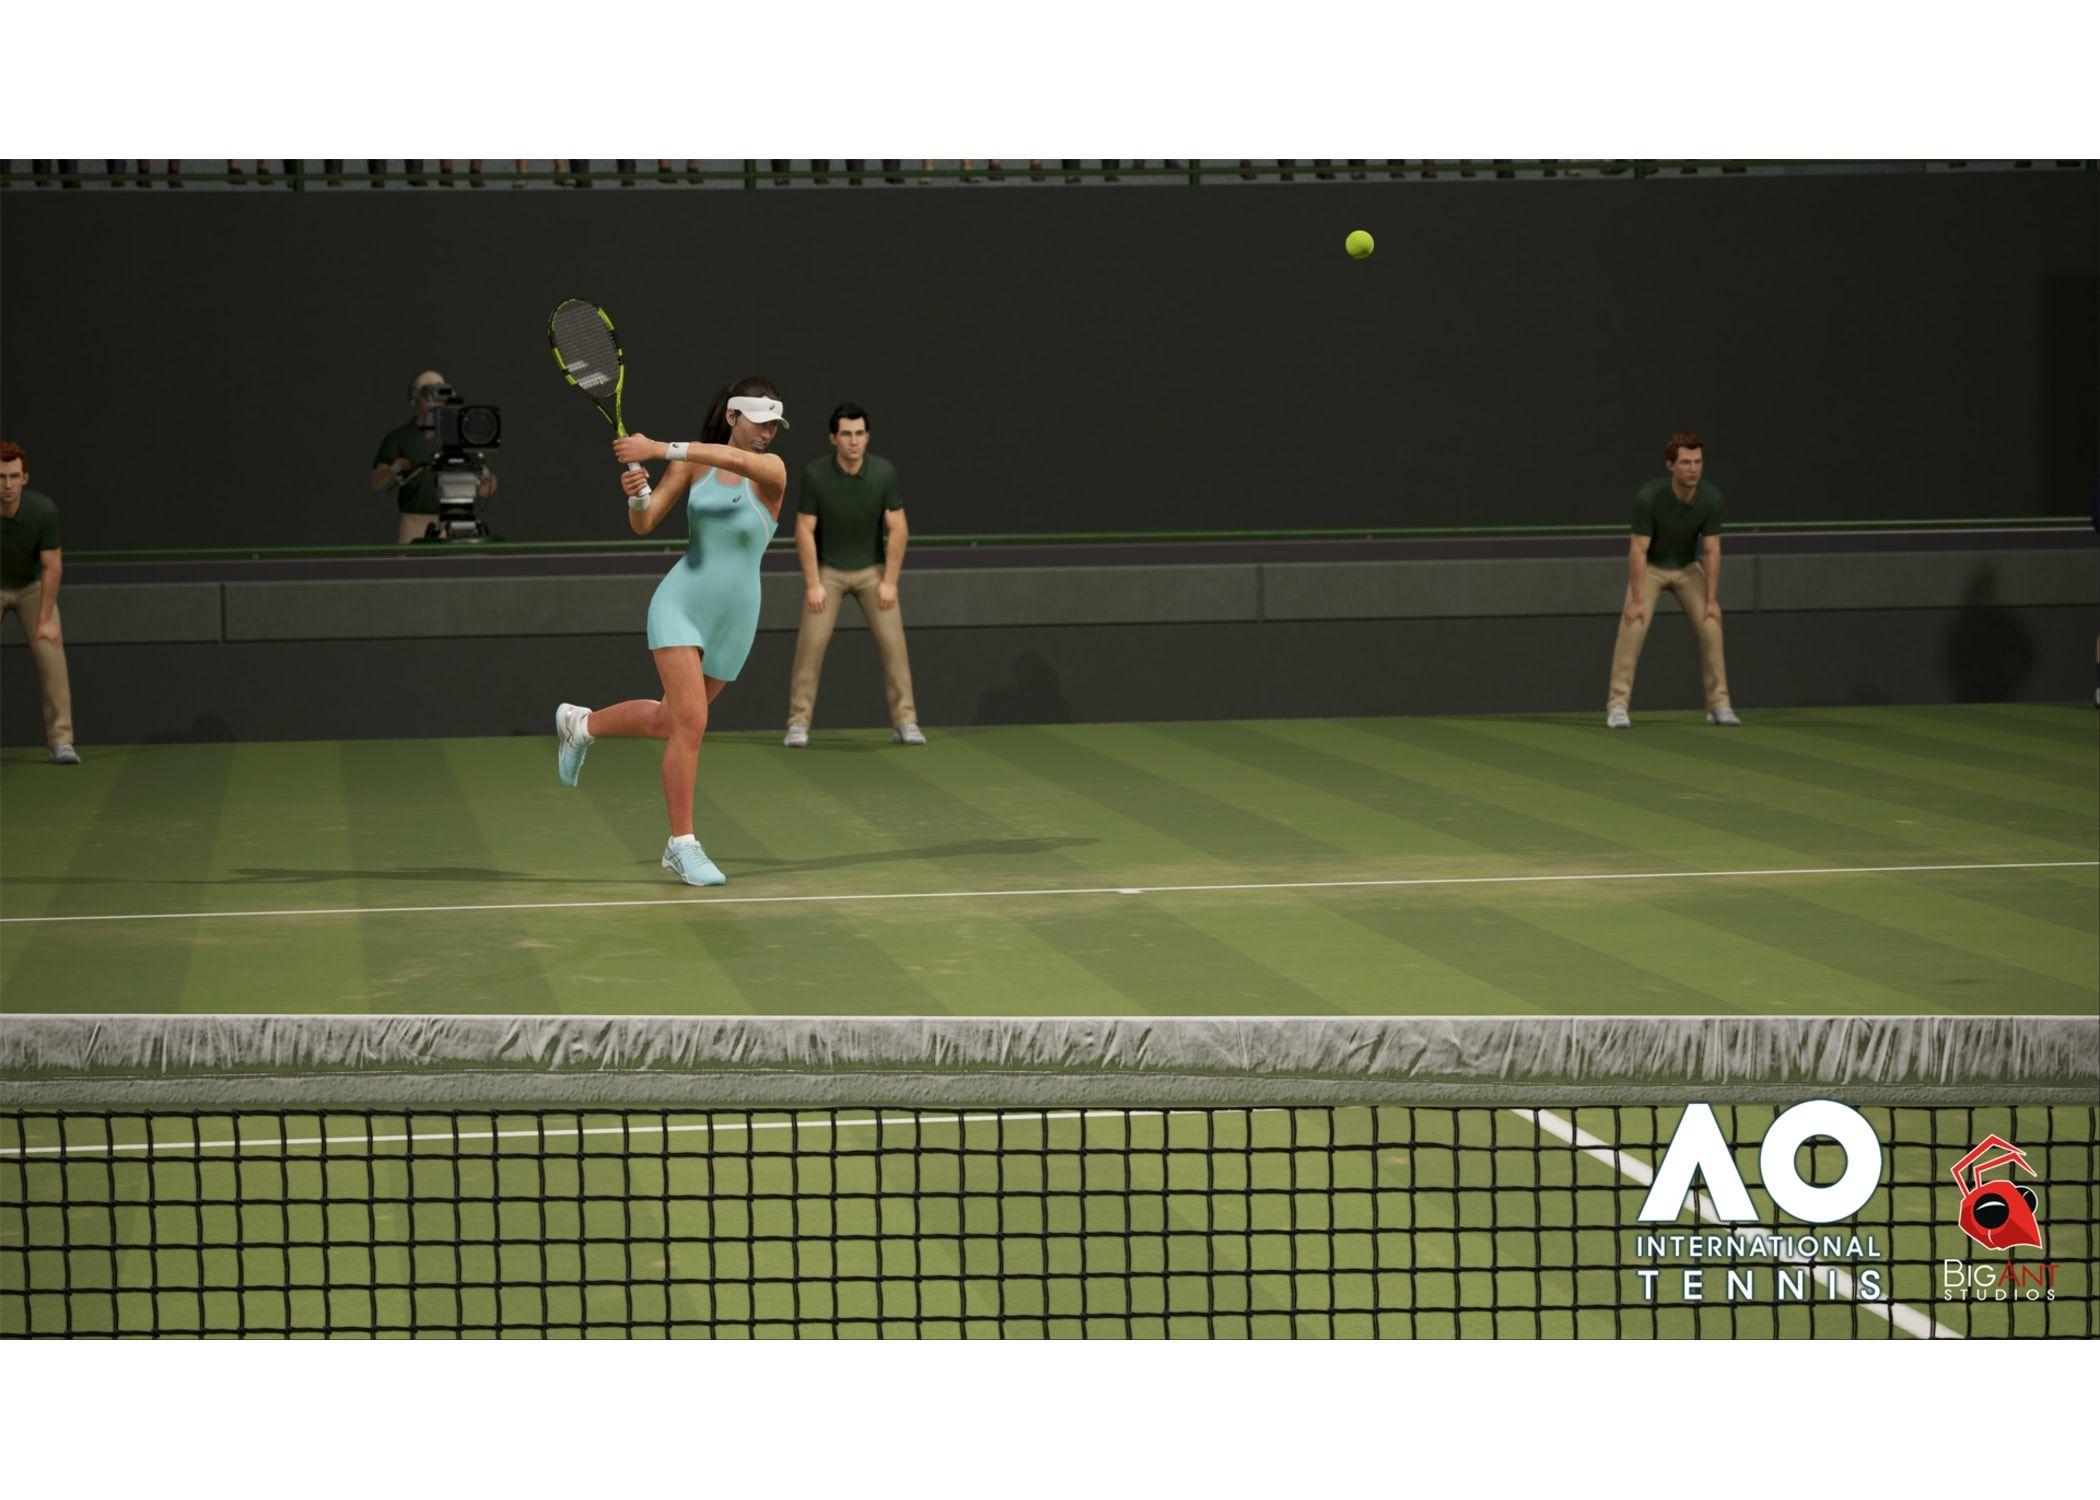 Ao International Tennis In 2020 Tennis Games Tennis Soccer Field